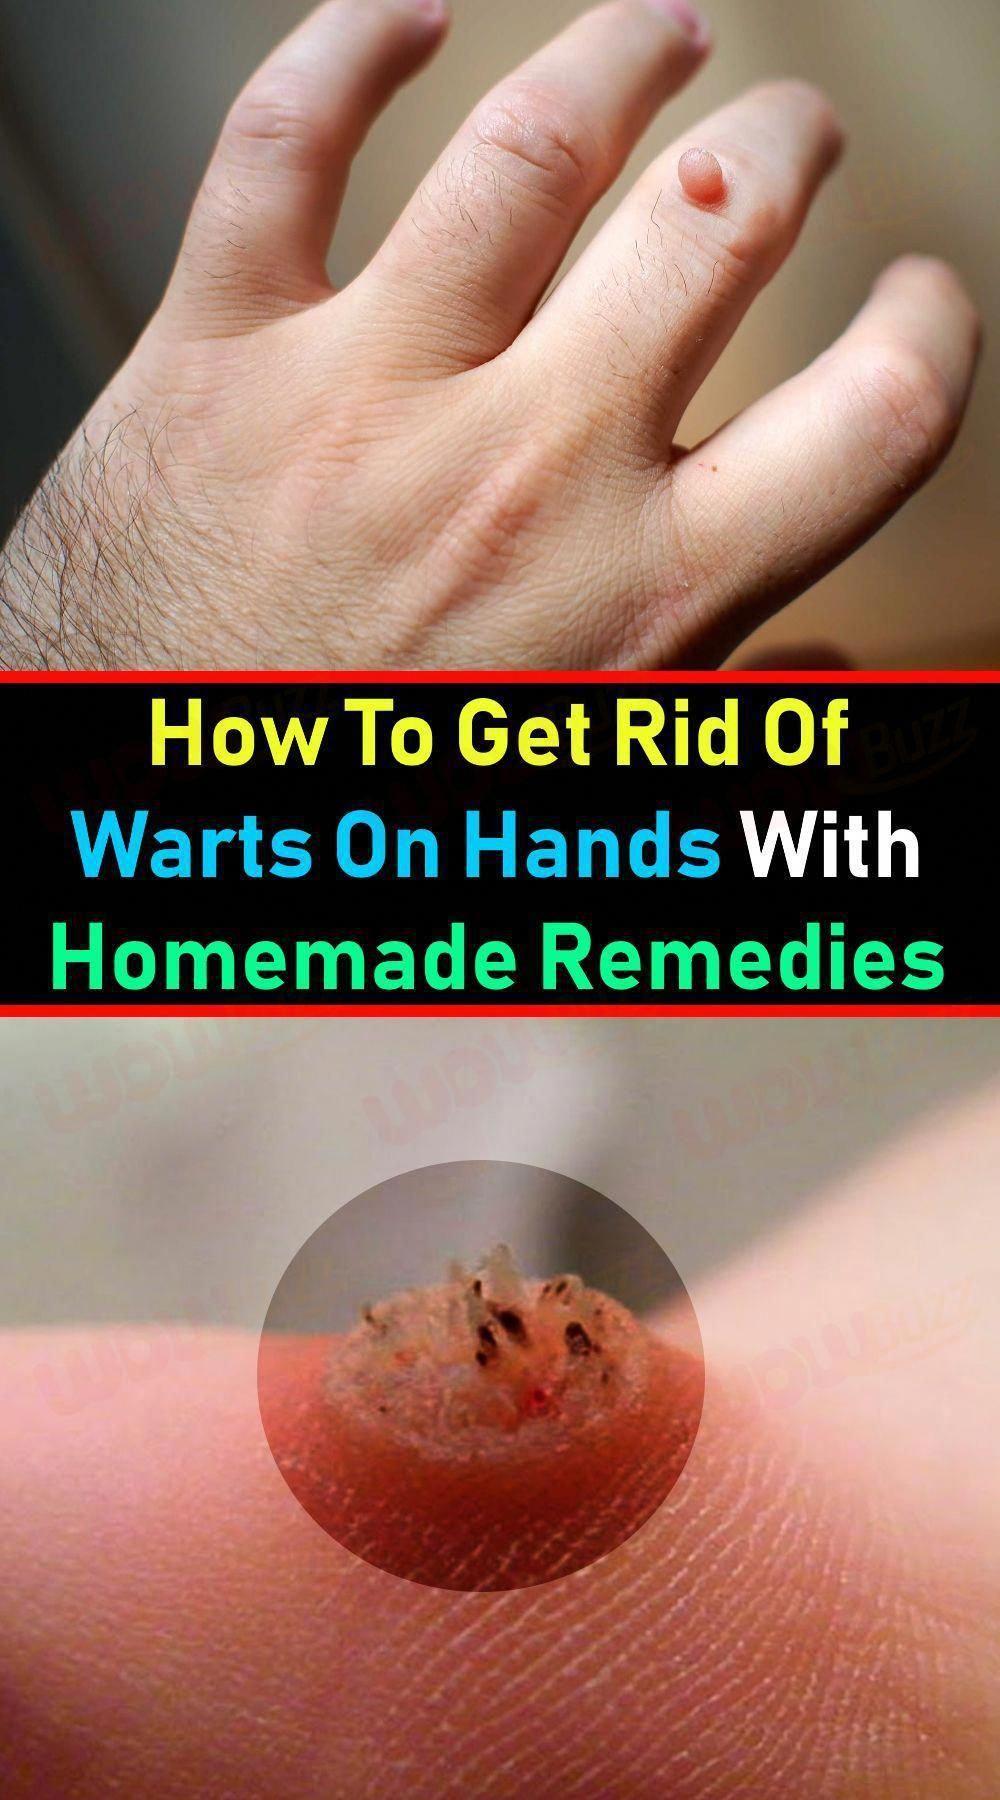 a068b3d8a2b9192524521c38e0245108 - How To Get Rid Of Tiny Warts On Hands